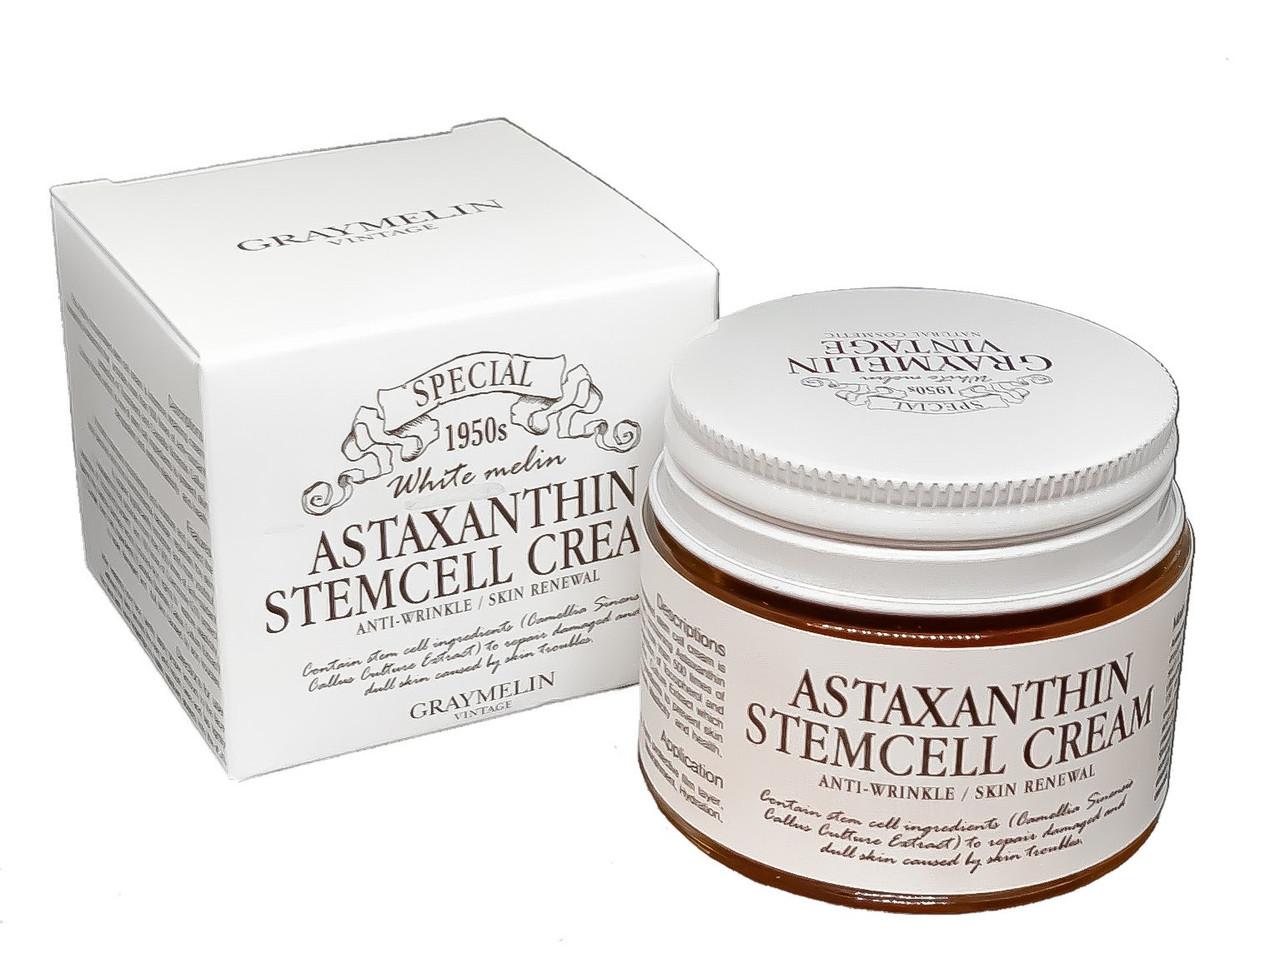 Омолоджуючий гель-крем Graymelin Astaxanthin Stemcell cream